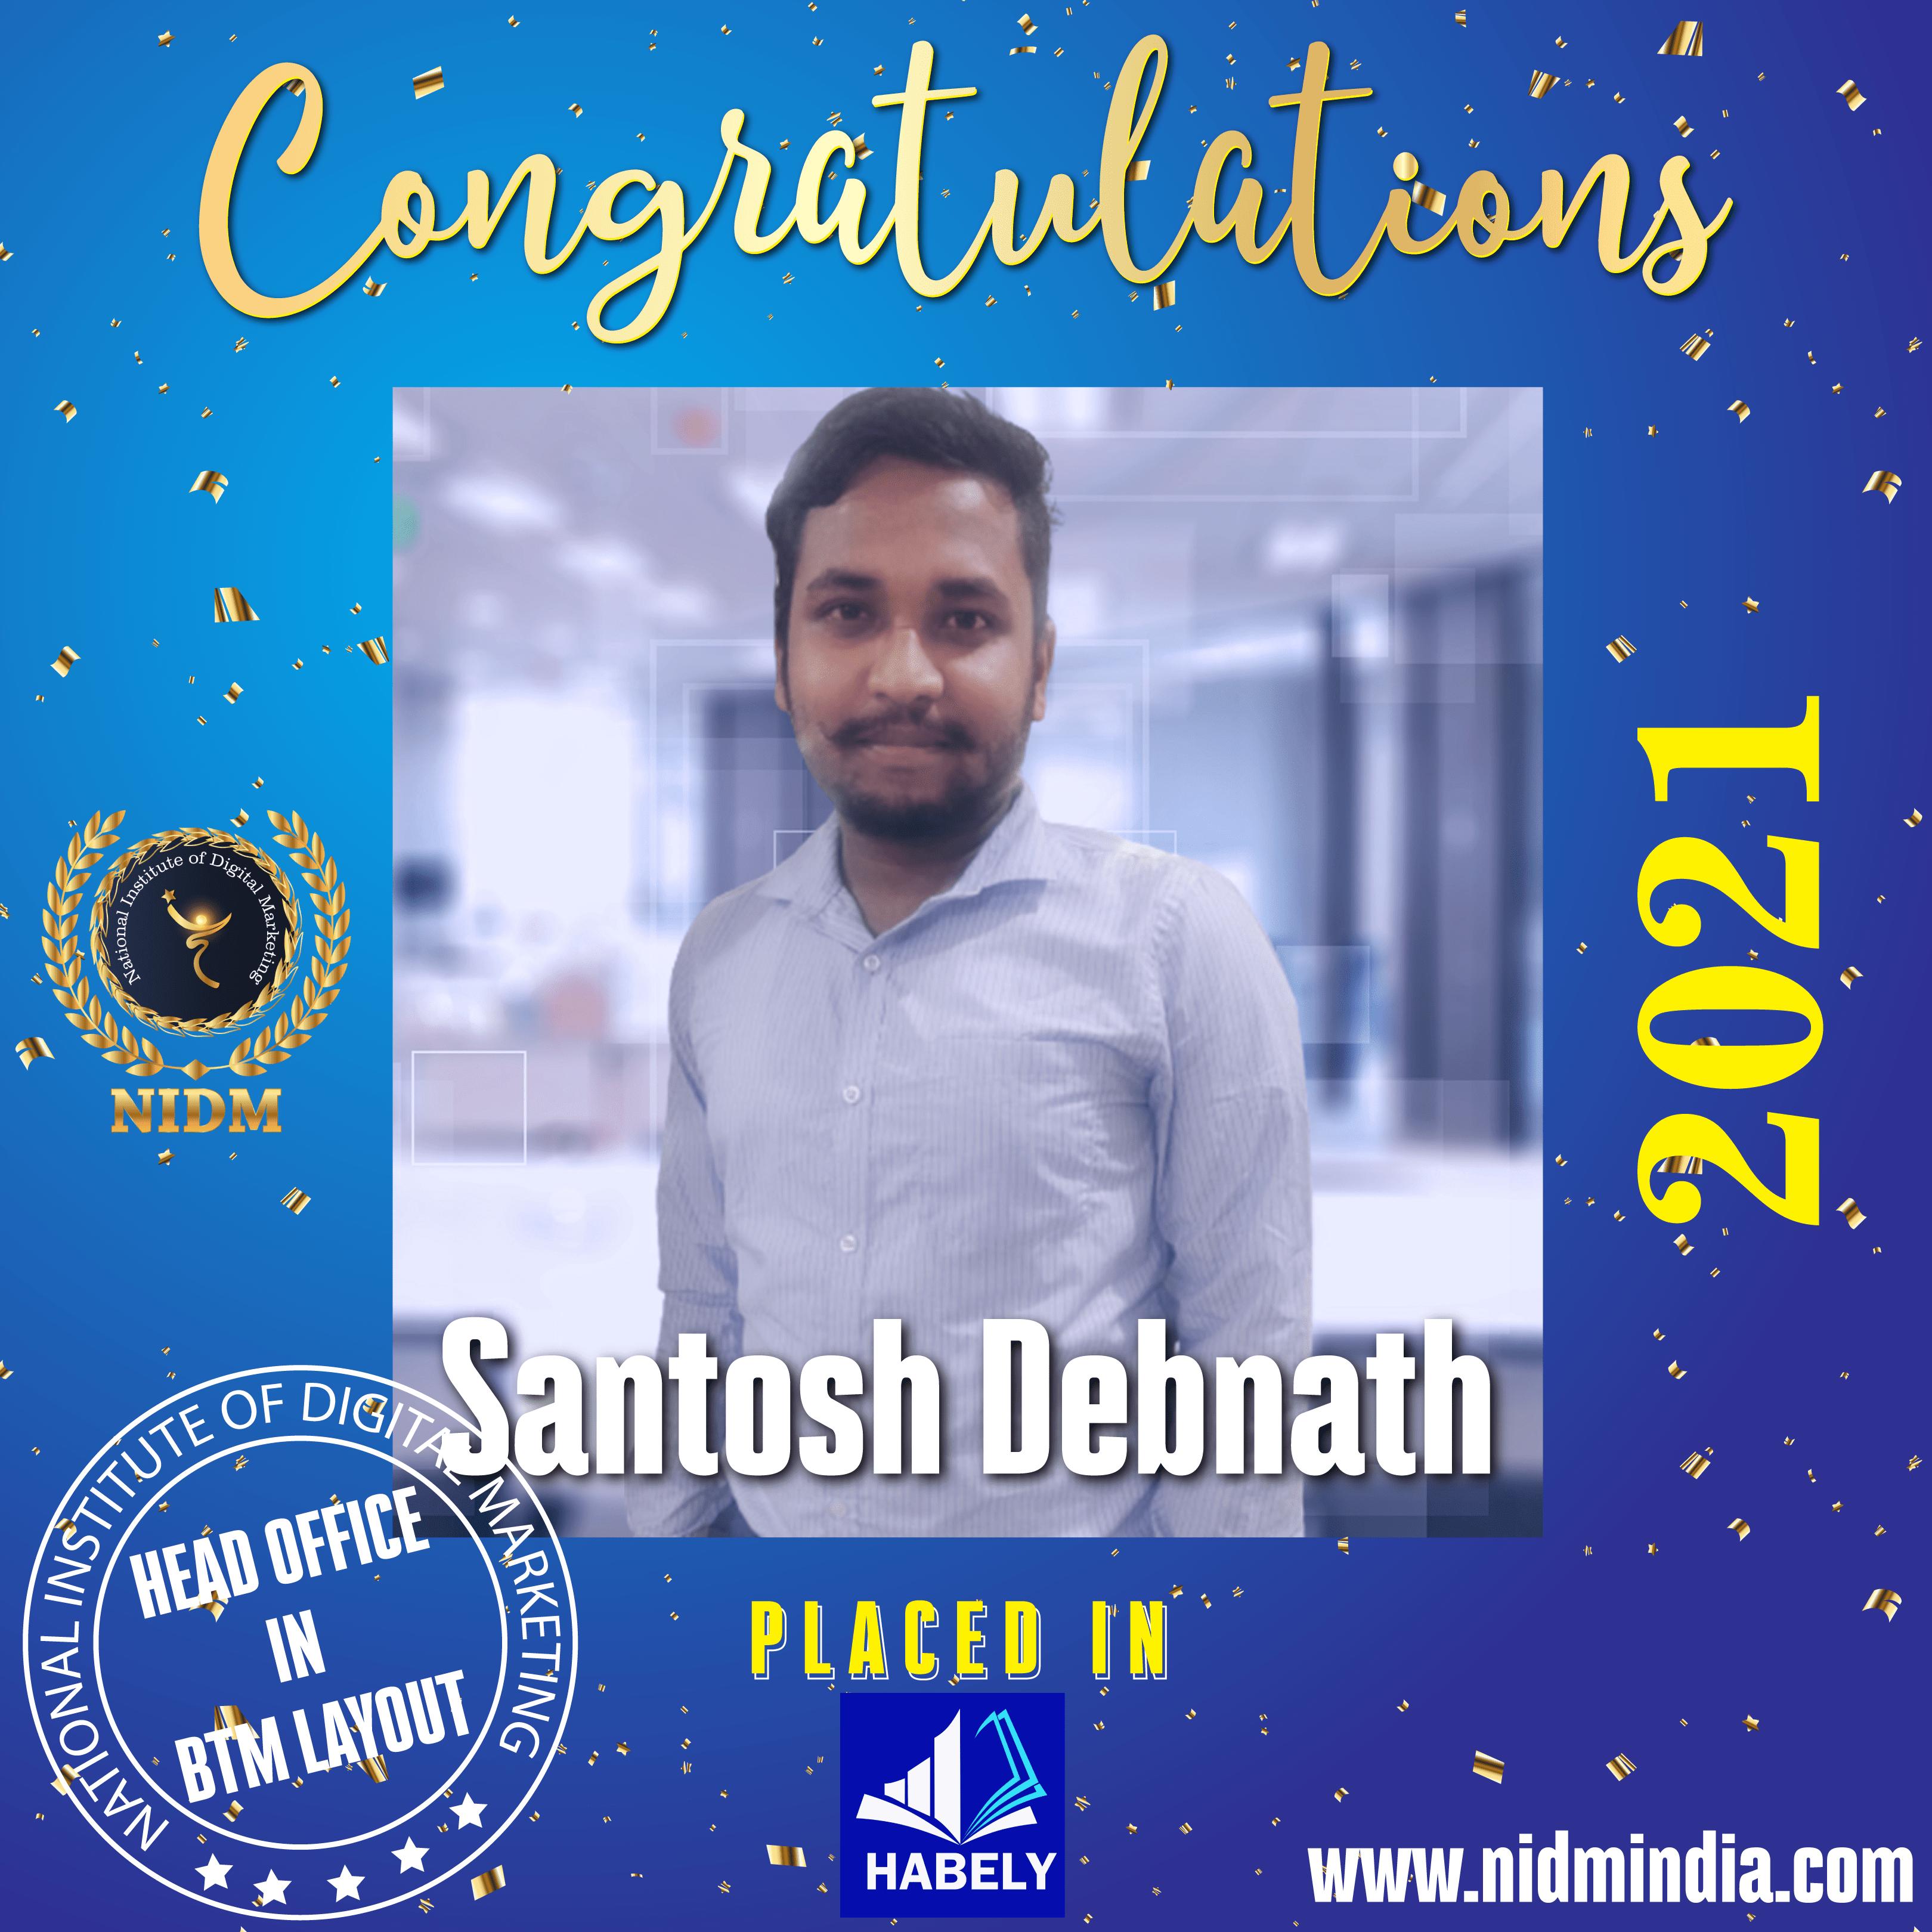 Santosh-Debnath-nidmindia-placement-head-office-in-btm-layout (1)-min